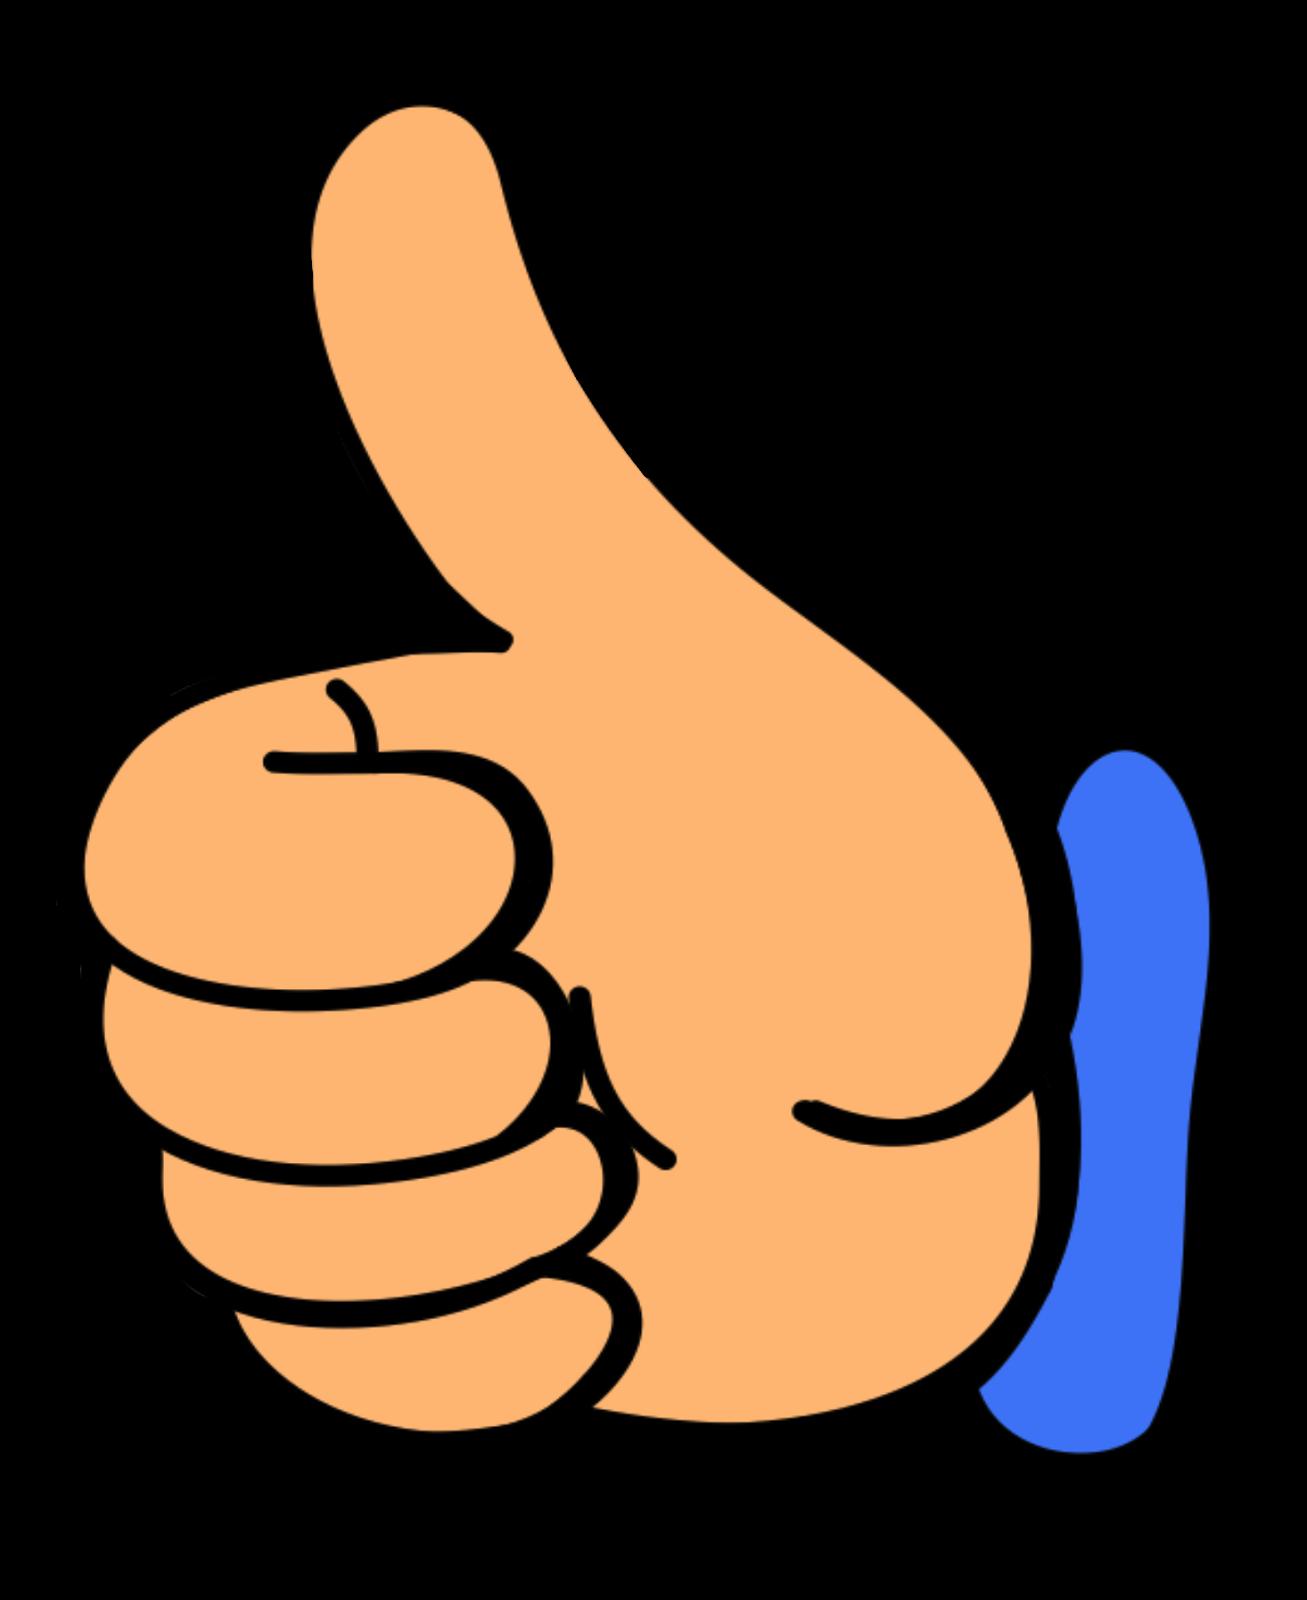 thumbs up clip art clipart panda free clipart images rh clipartpanda com free thumbs up pictures clip art Free Clip Art of Emojis Thumbs Up